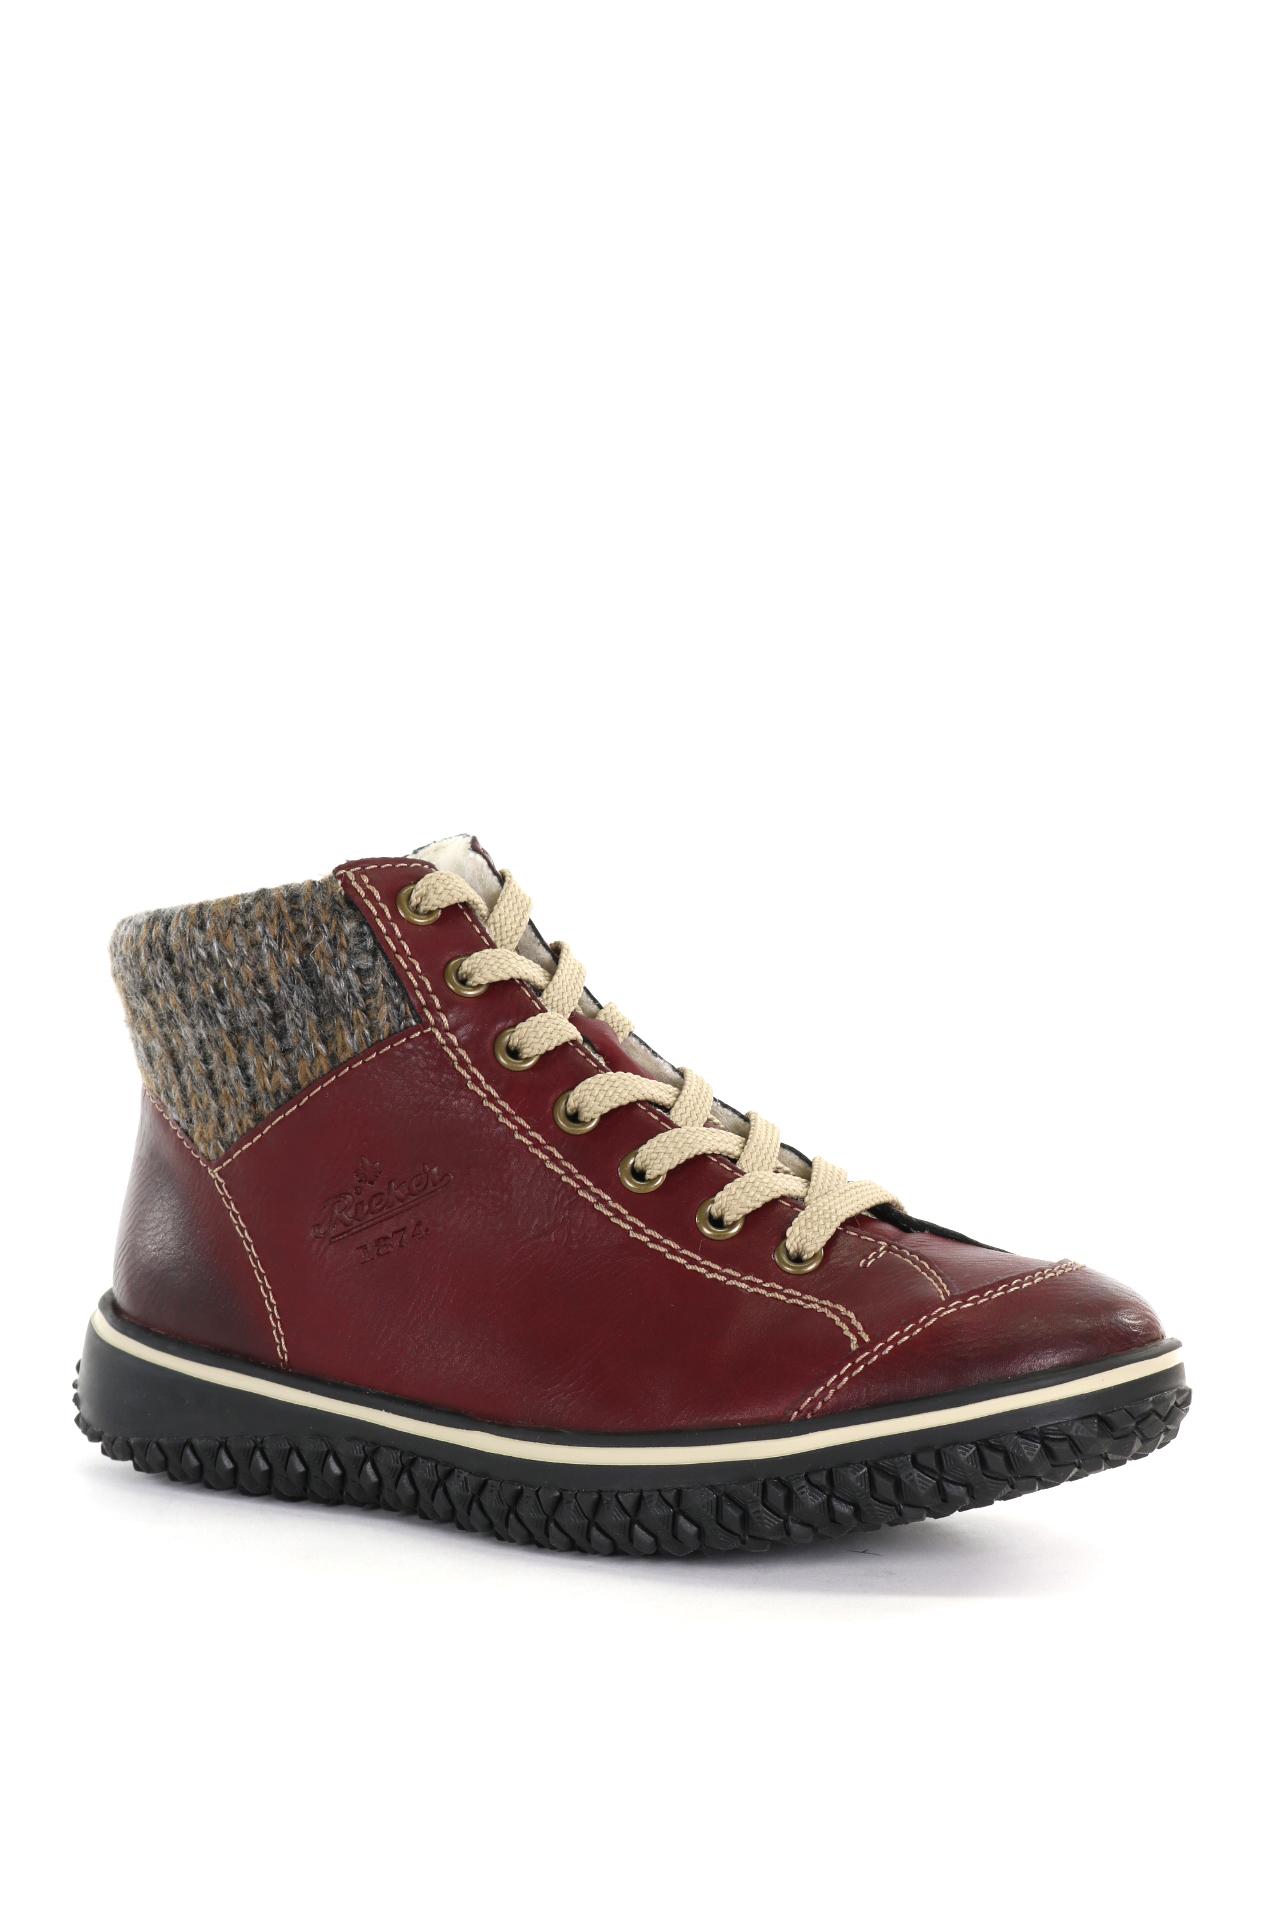 Rieker Z4243 35   Caron Chaussures